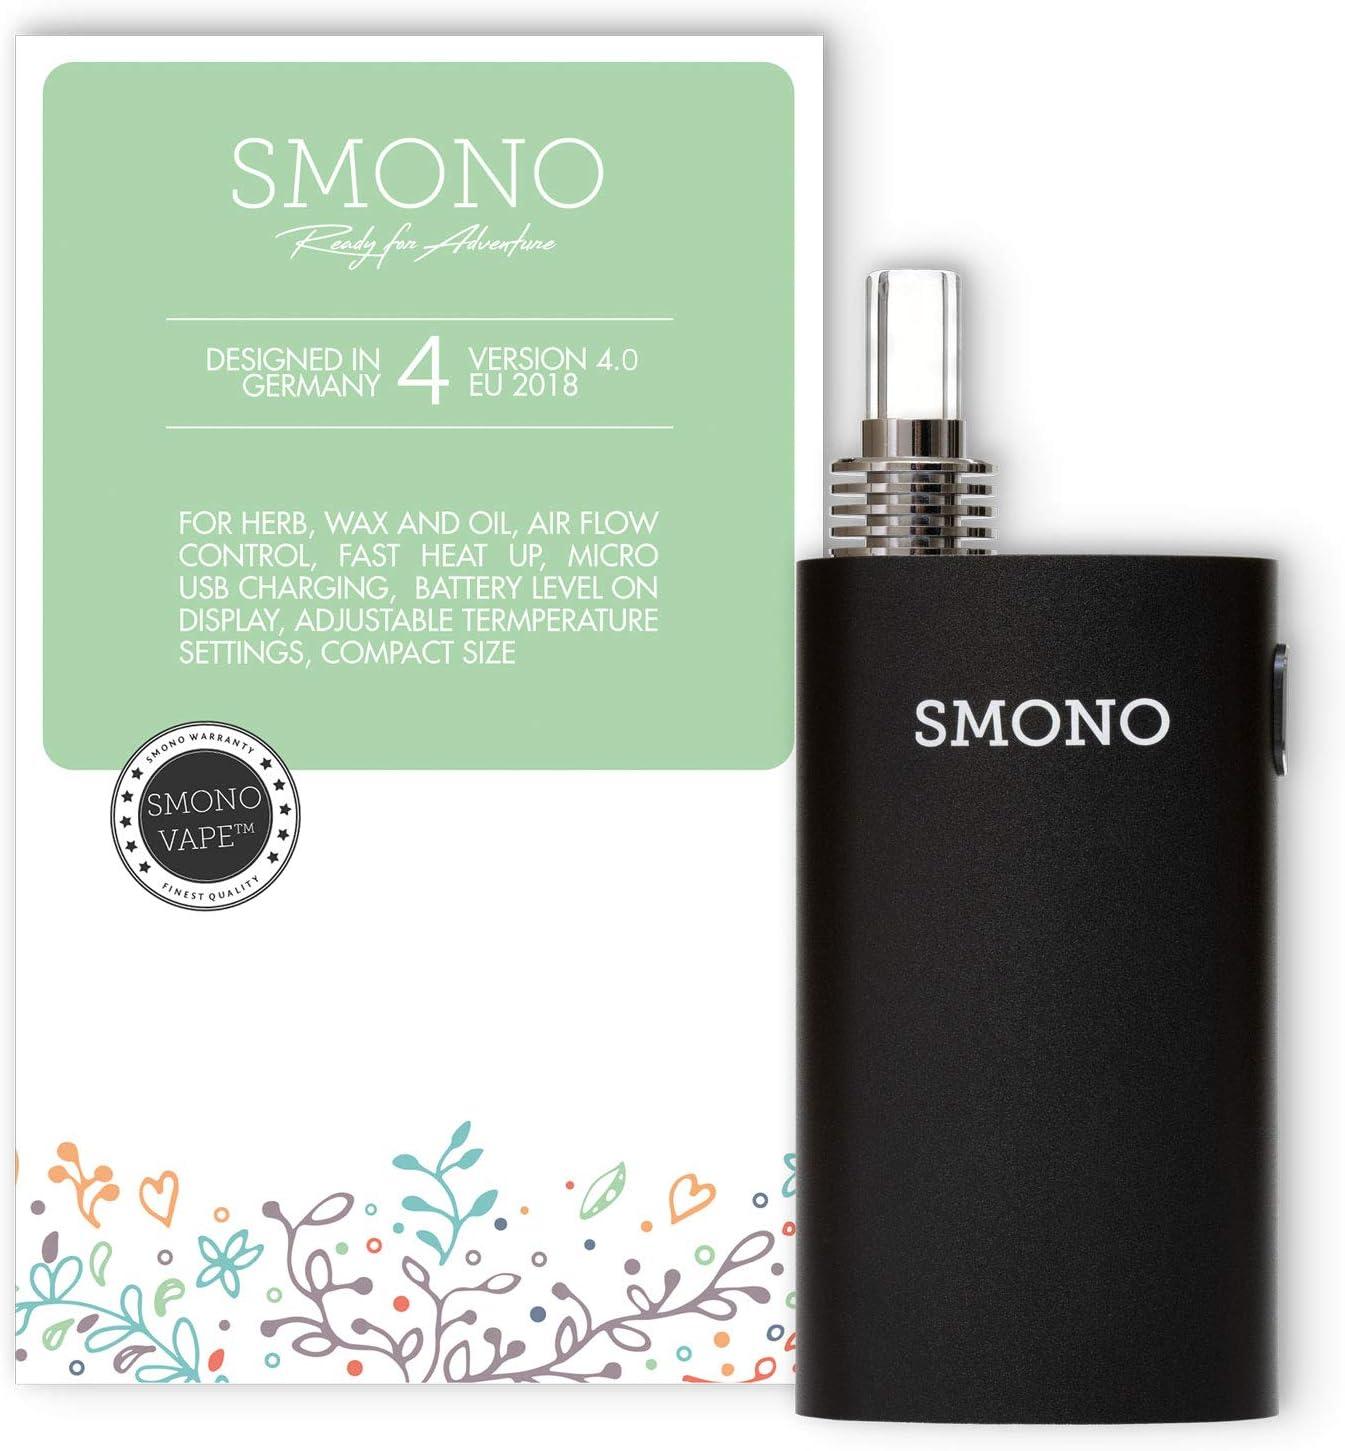 Vaporizador Smono 4.0 - Sin nicotina